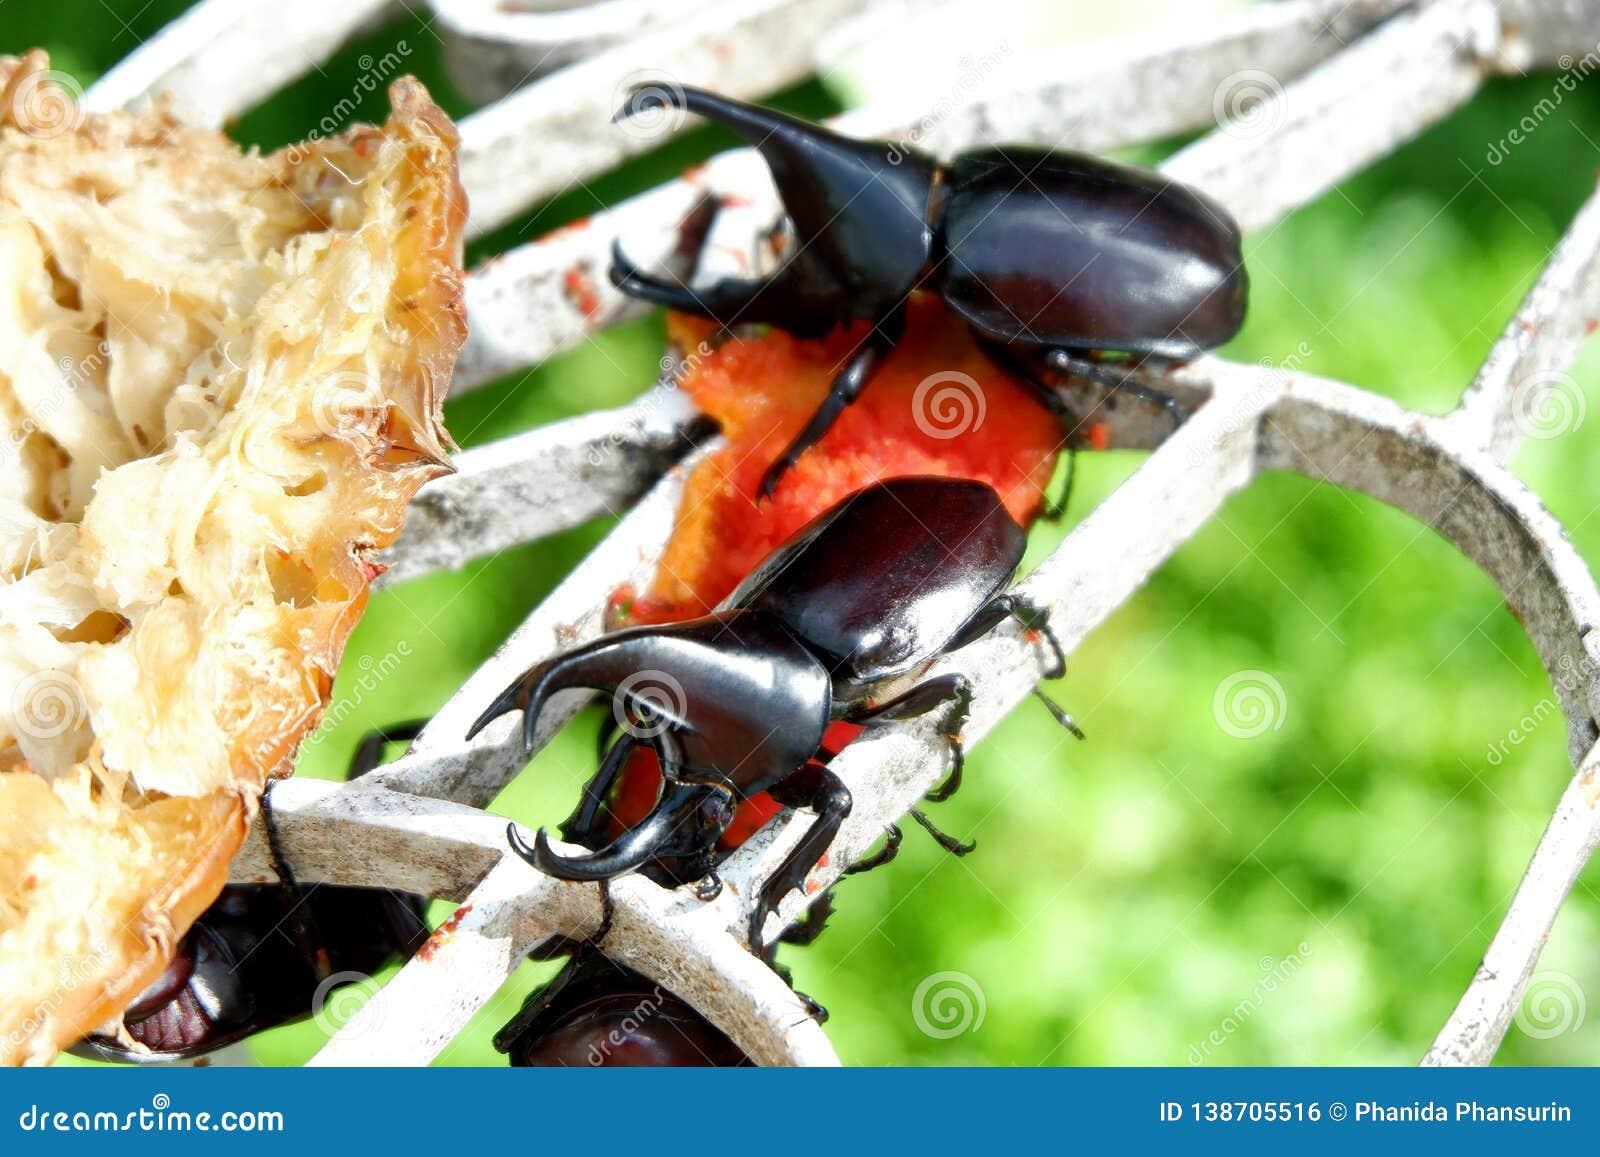 Гигантские жуки носорога Dynastinae